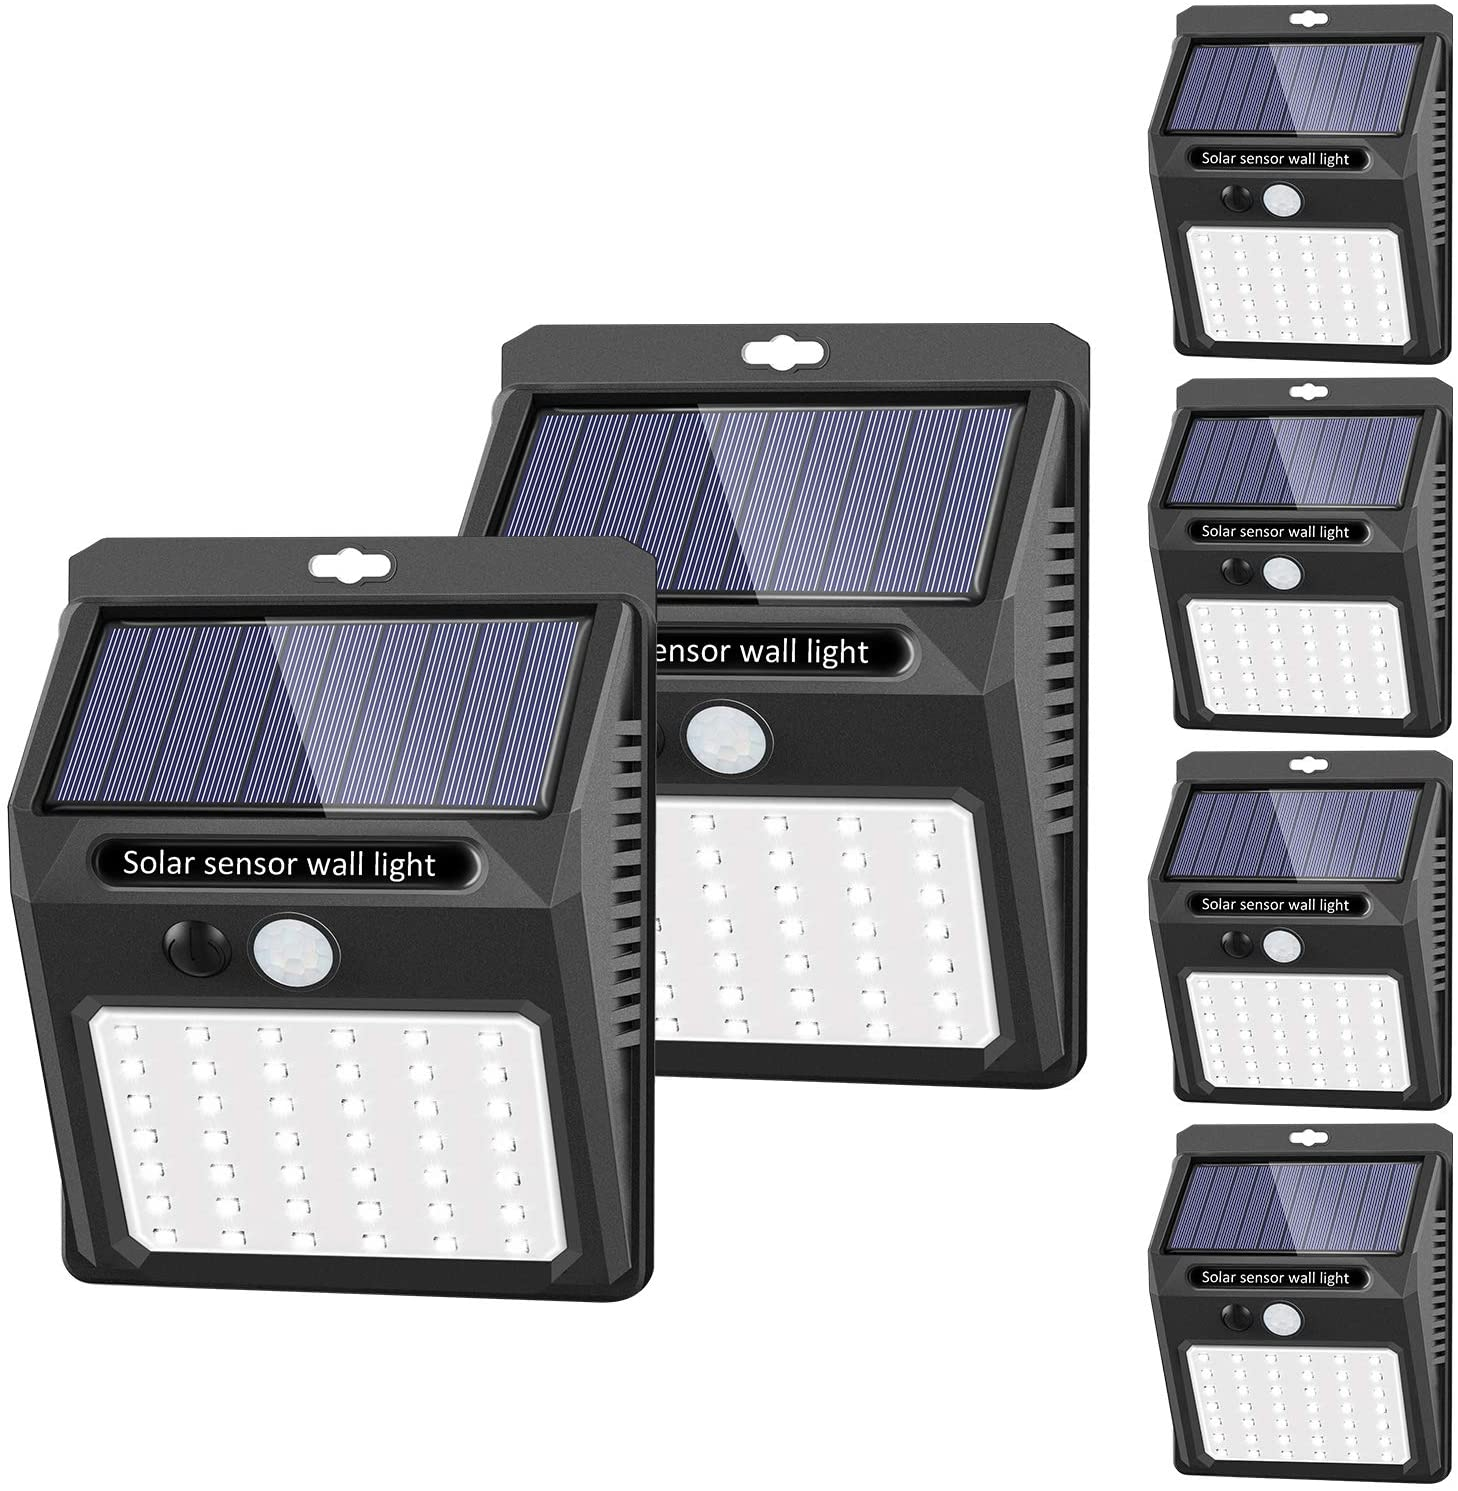 Sezac wall-mountable solar light, best solar lights